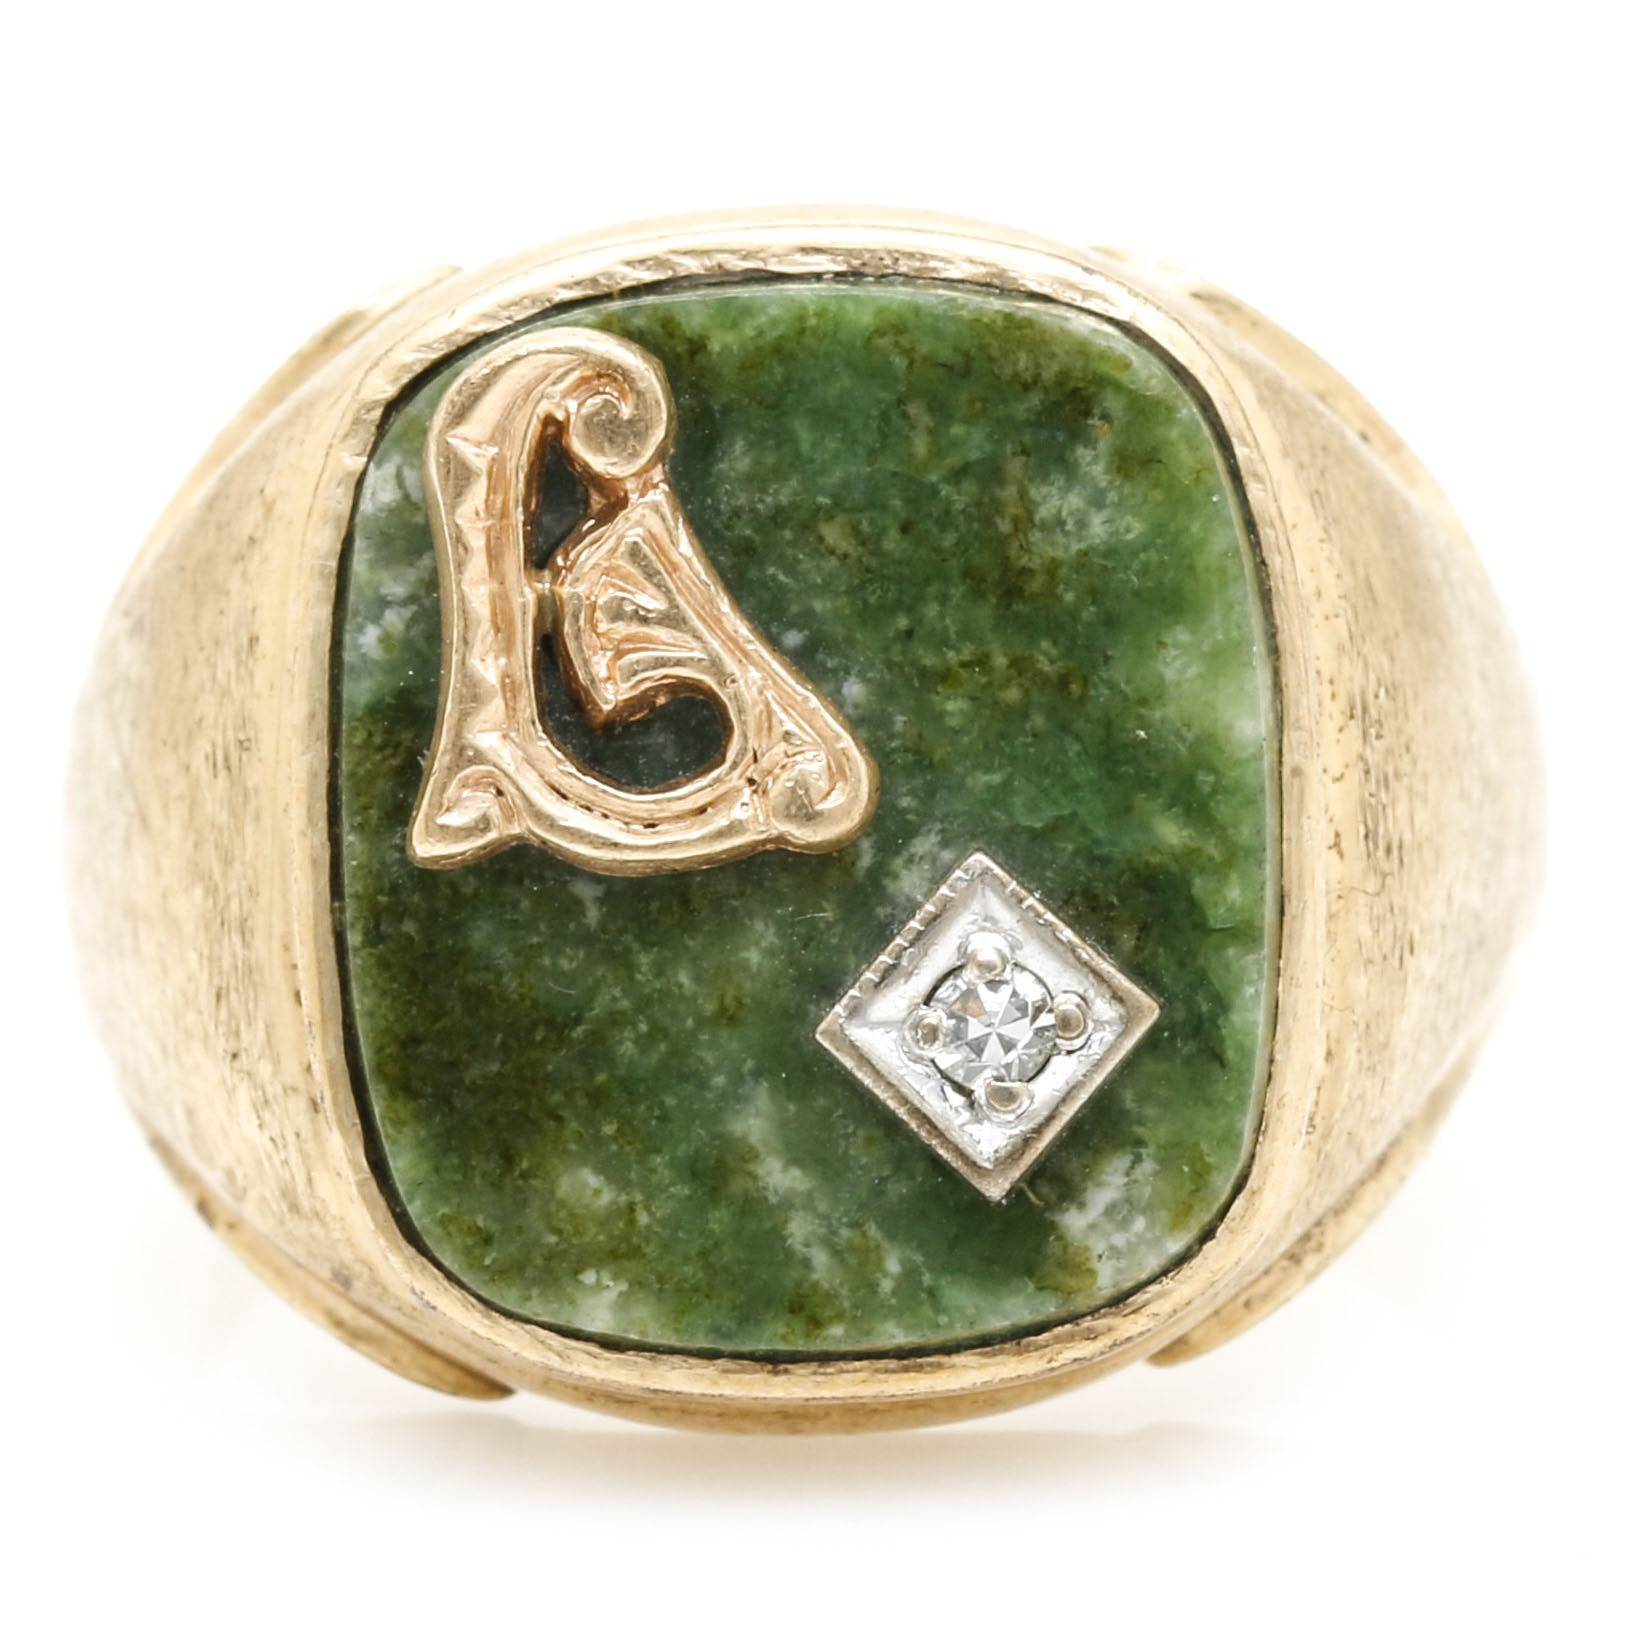 10K Yellow Gold Connemara Marble and Diamond Ring